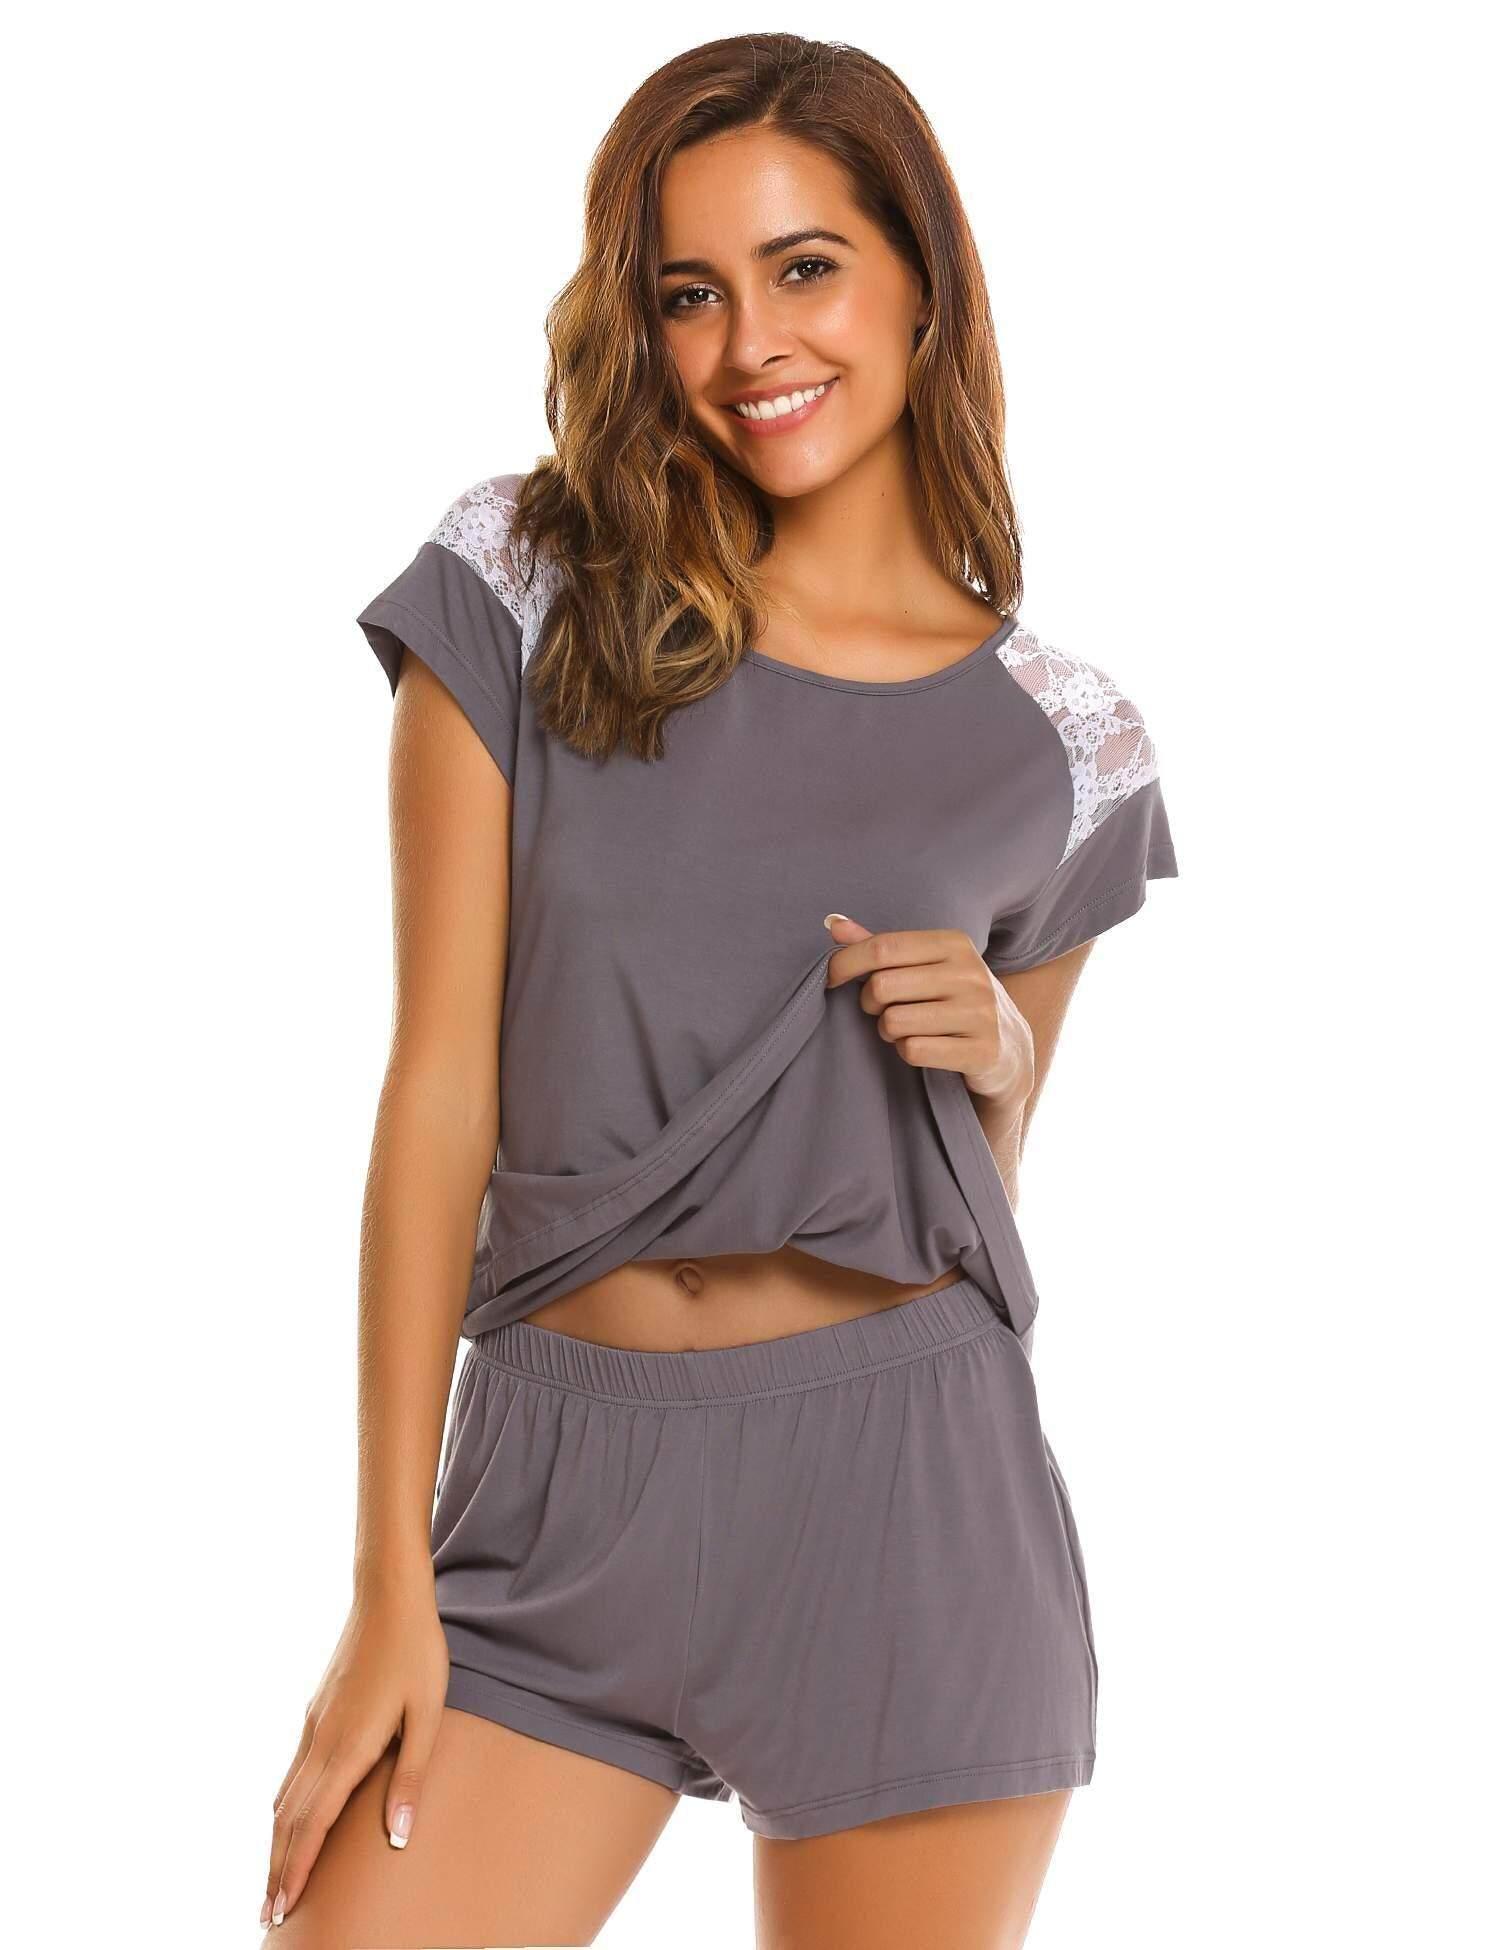 Cyber Sales Women O-Neck Short Sleeve Lace T-Shirt   Shorts Pajama Set 555cd3546